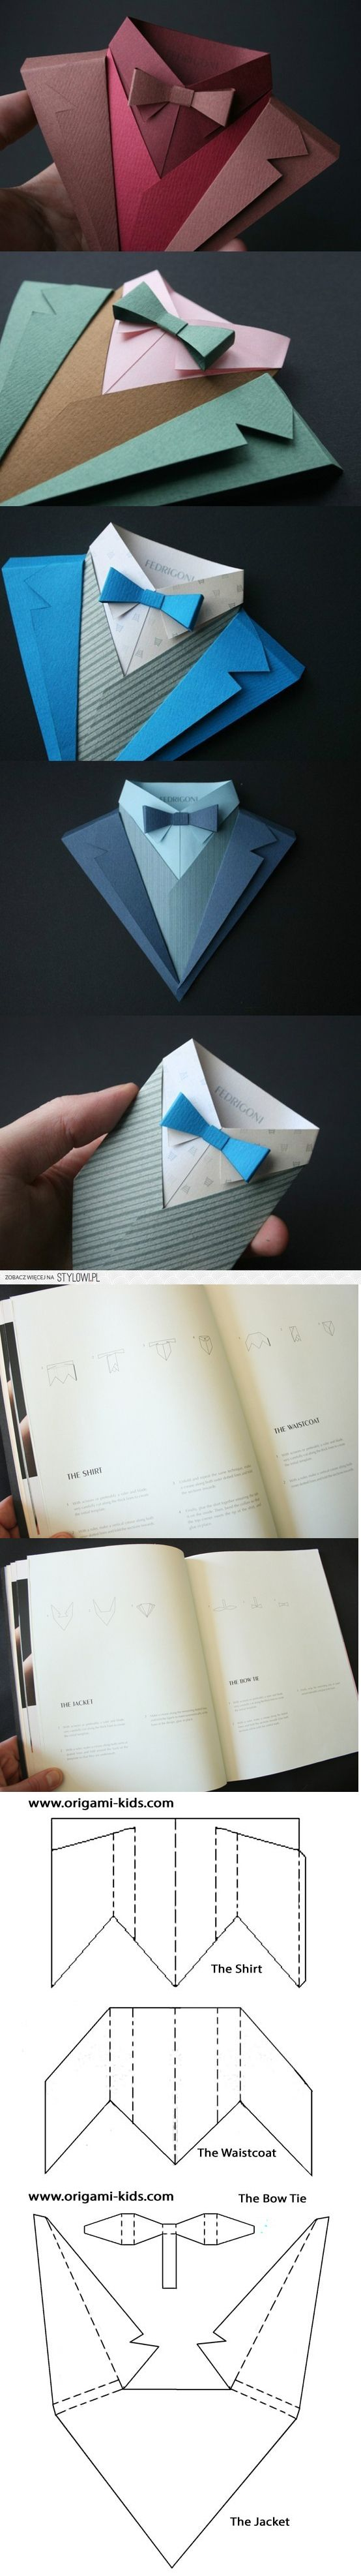 Fête des pères - Origami. jonathan-shackleton